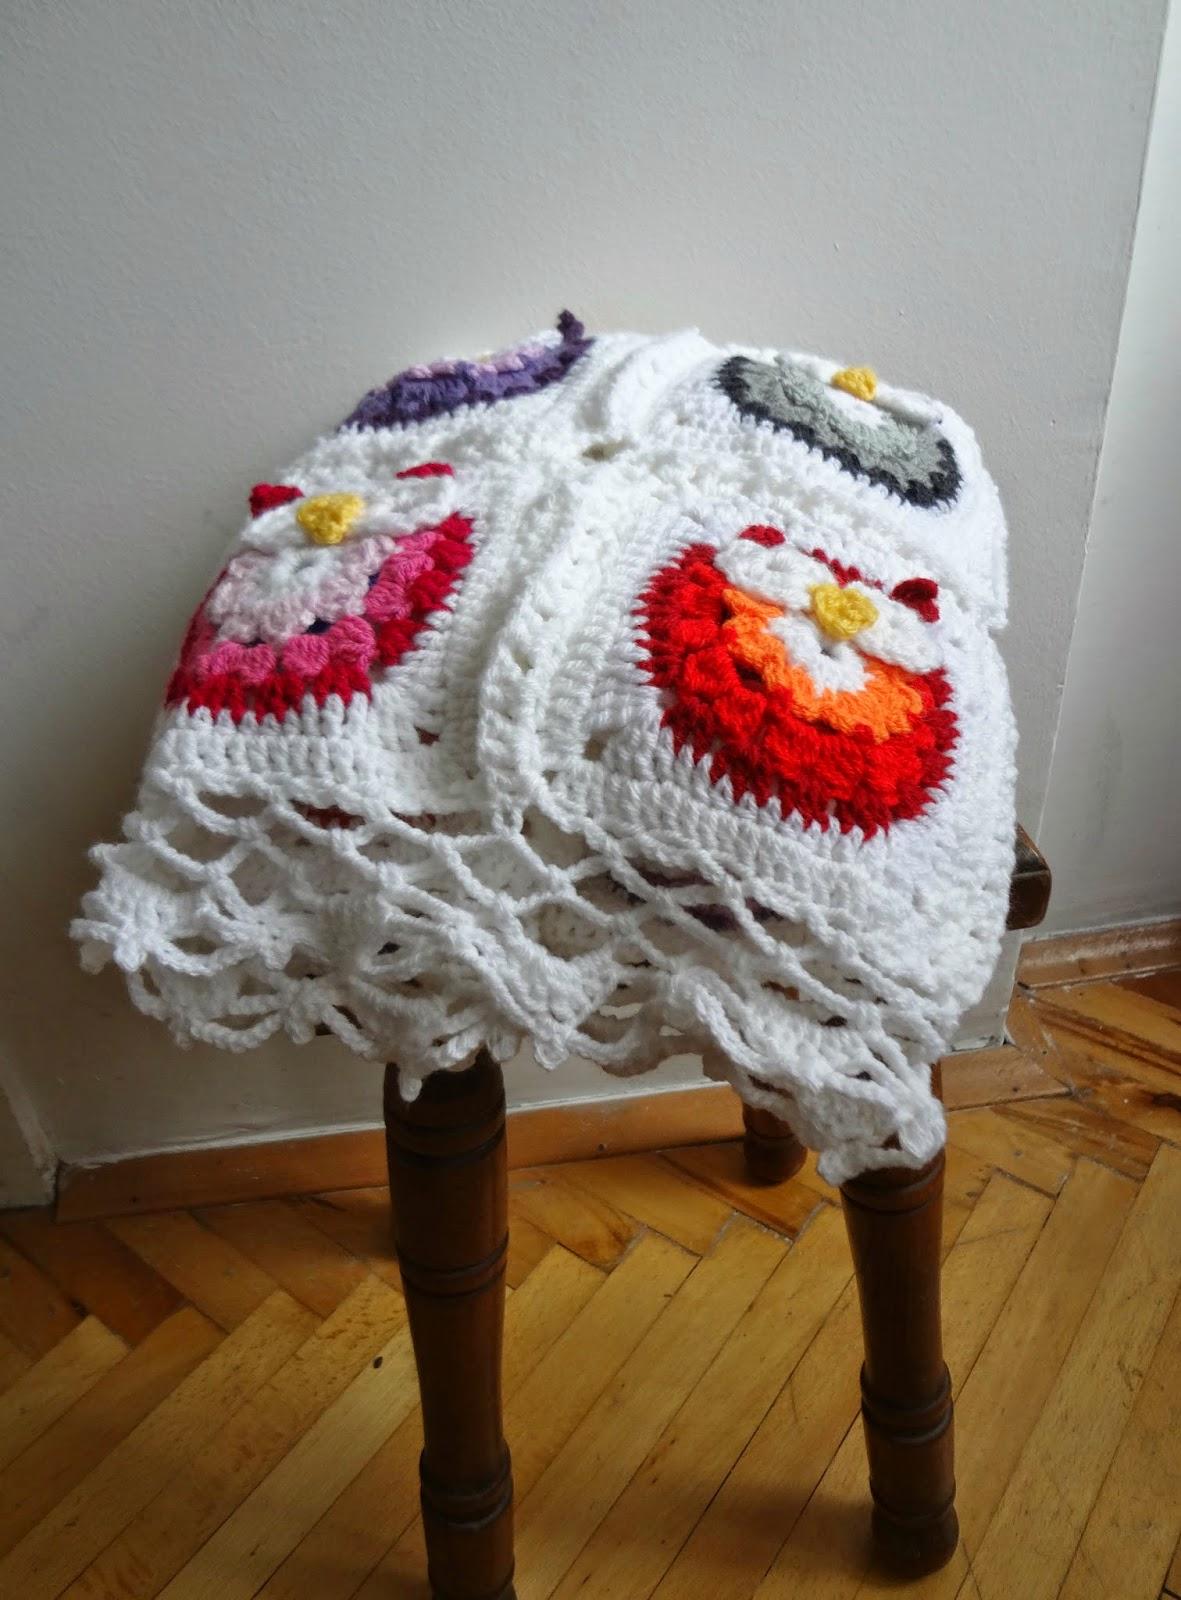 Little Treasures Crochet Owl Blanket Pattern